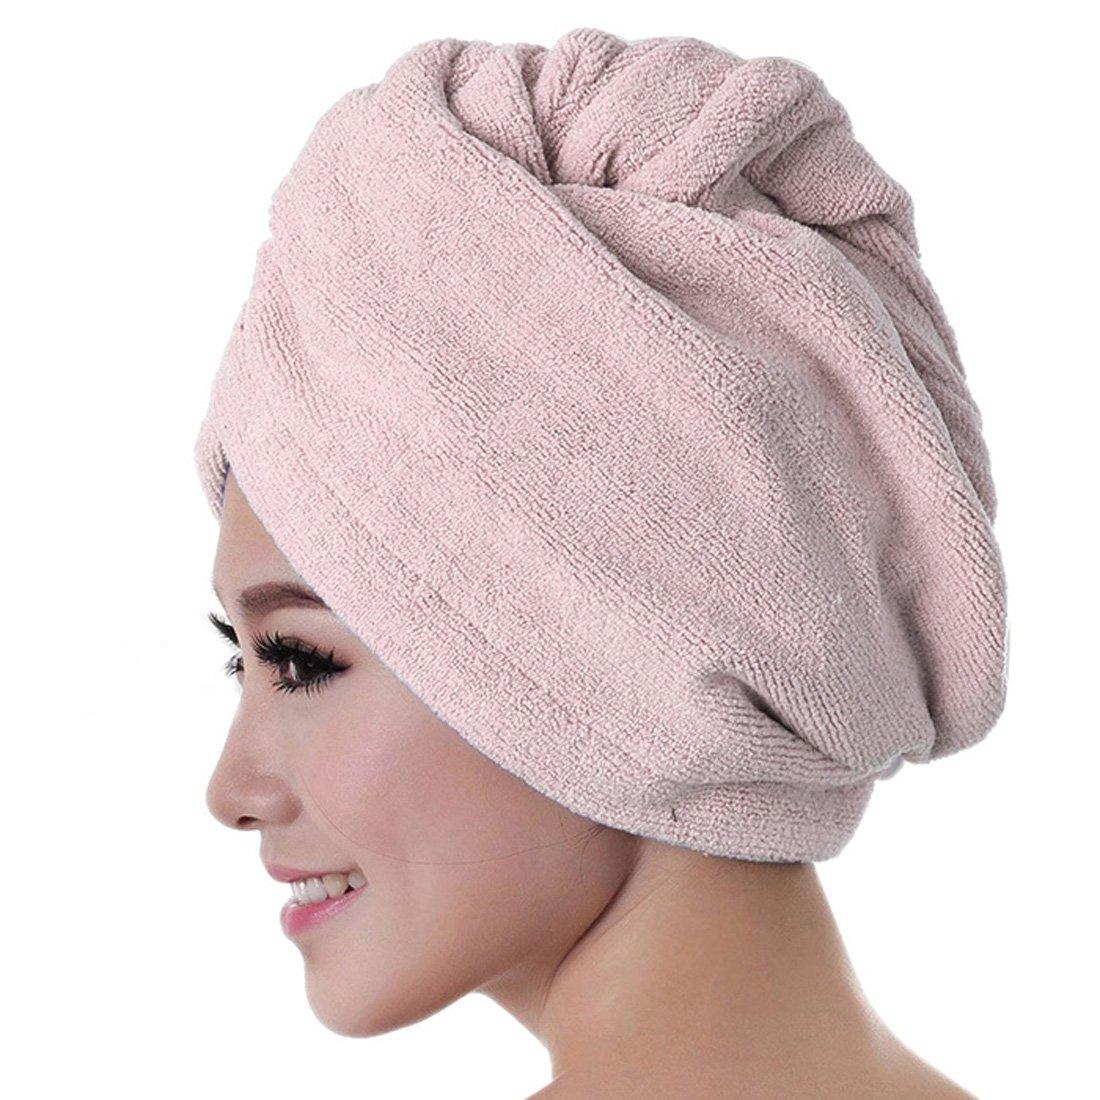 Yoyorulre Microfiber Bath Towel Hair Dry Hat Cap Quick Drying Lady Bath Tool (Purple) Yoyorule 1 Yoyorule 11